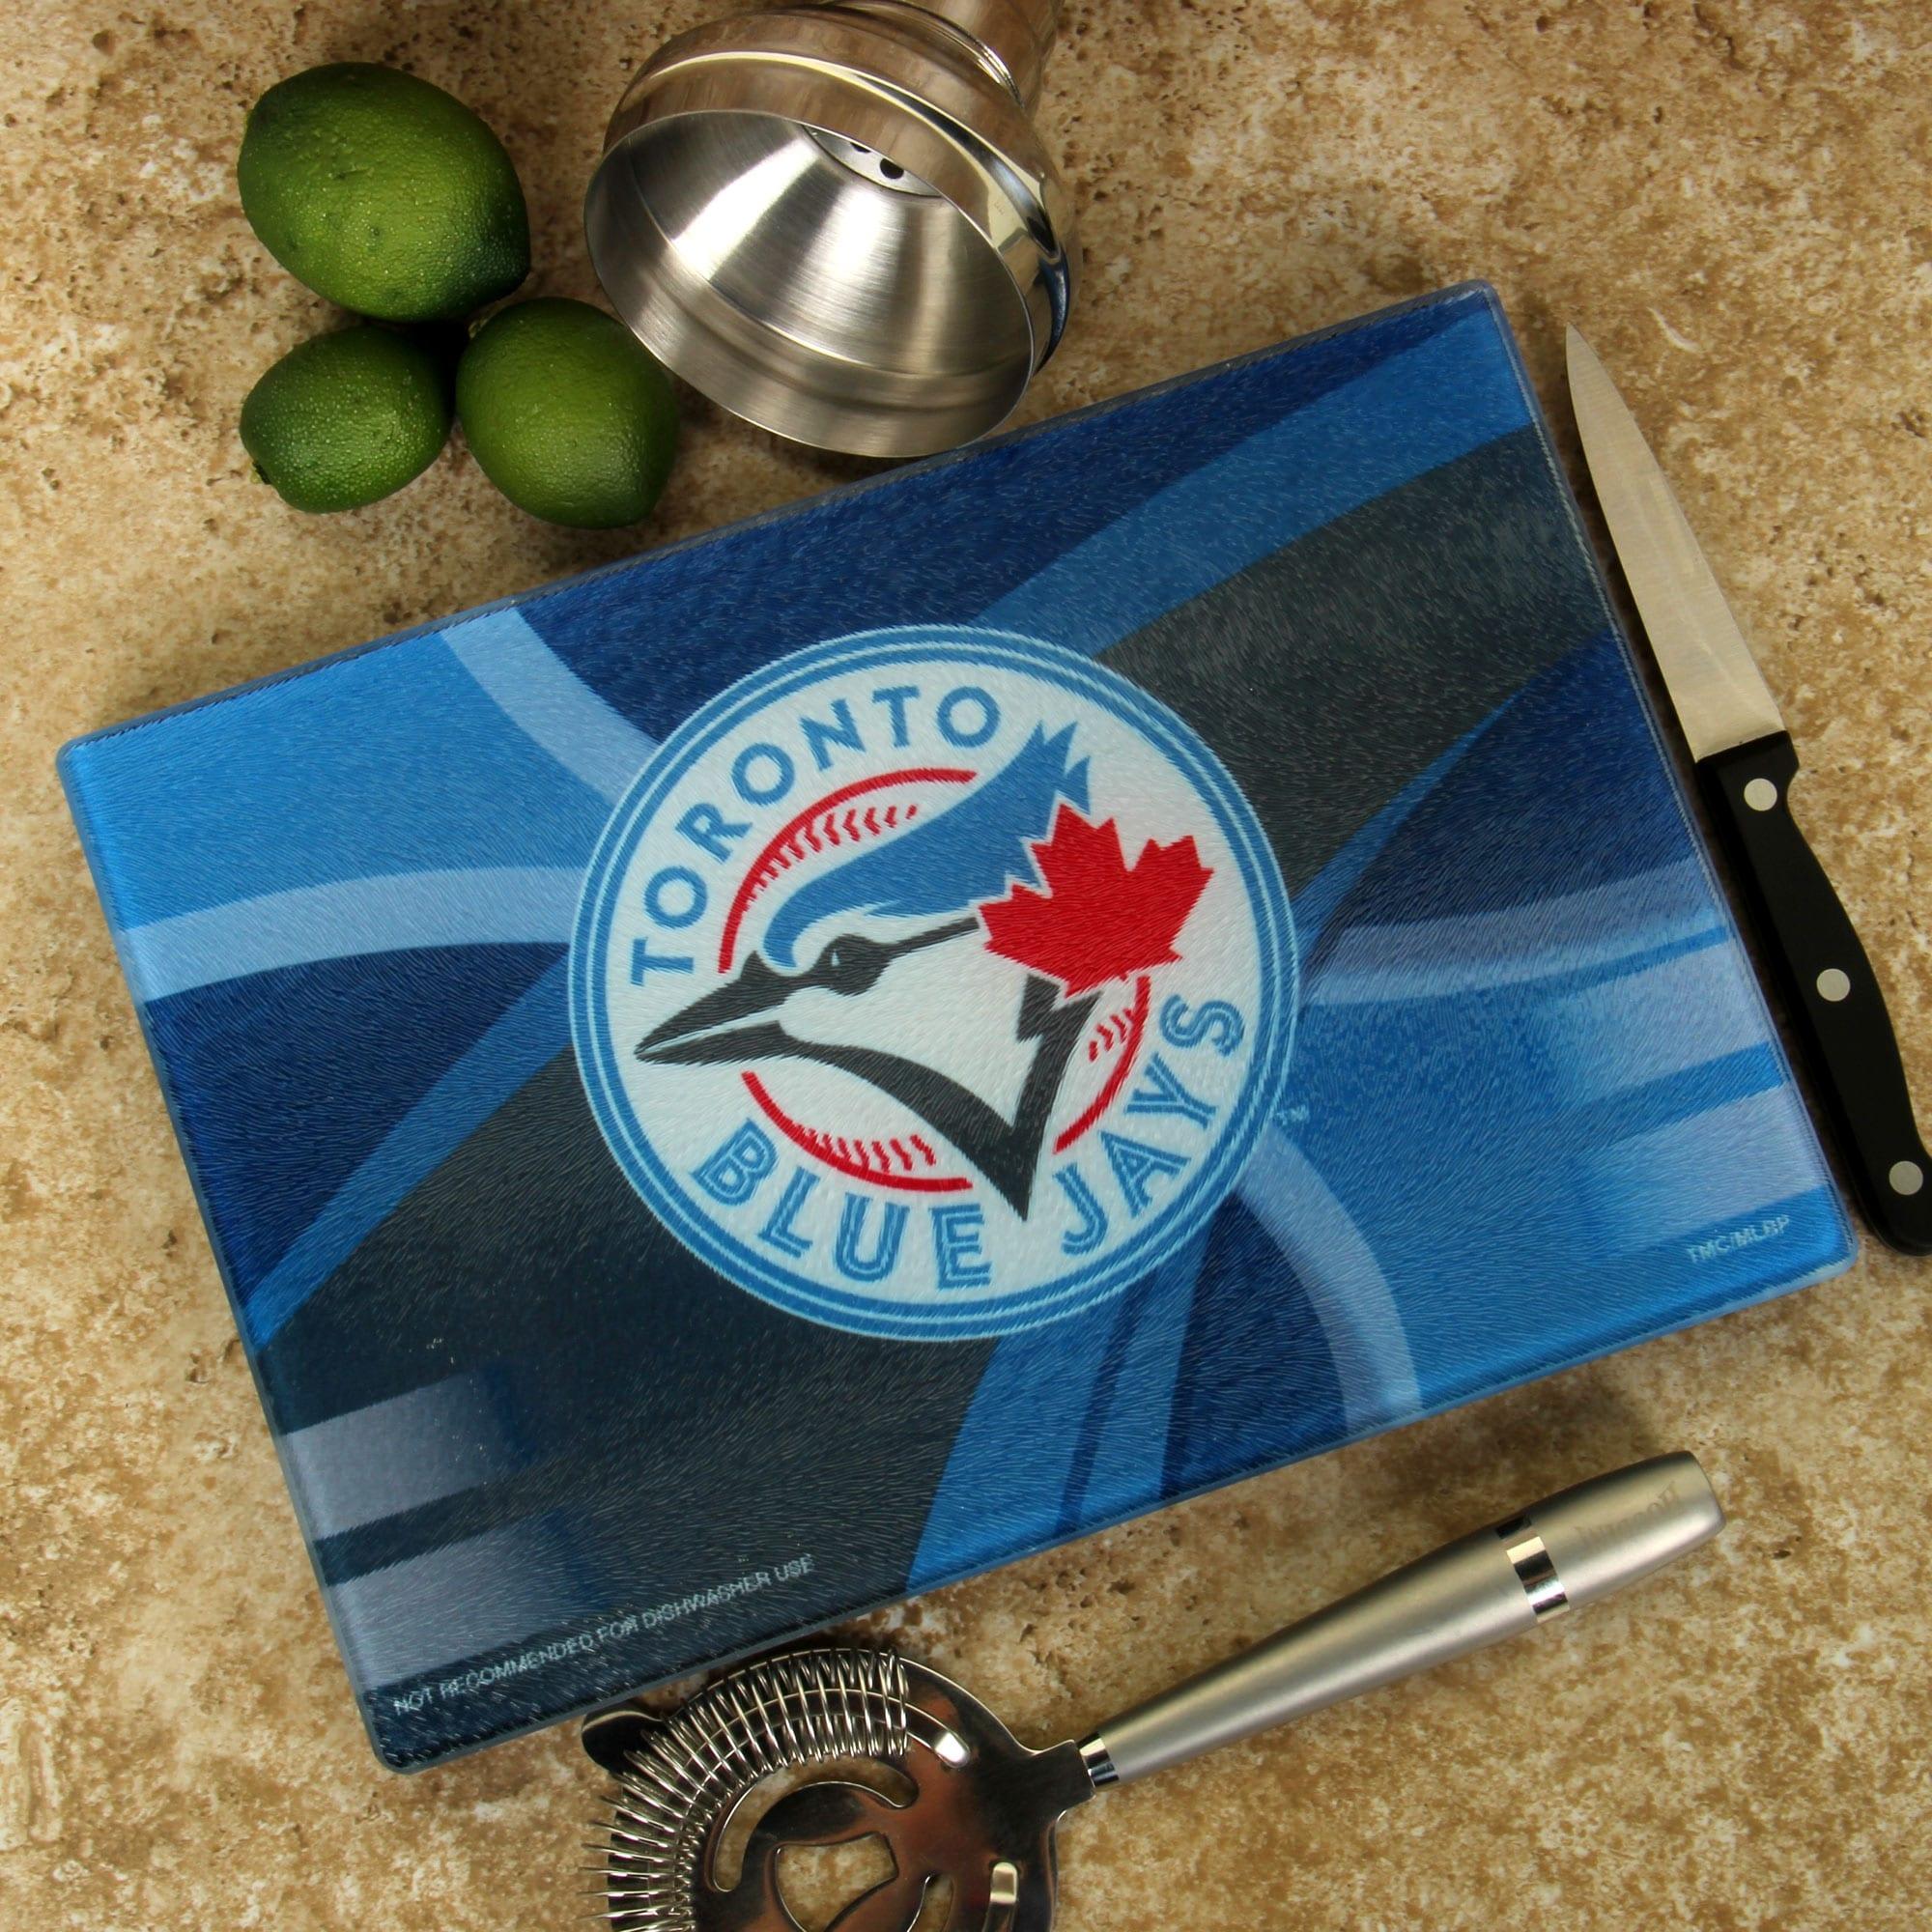 Toronto Blue Jays 8'' x 11.75'' Carbon Fiber Cutting Board